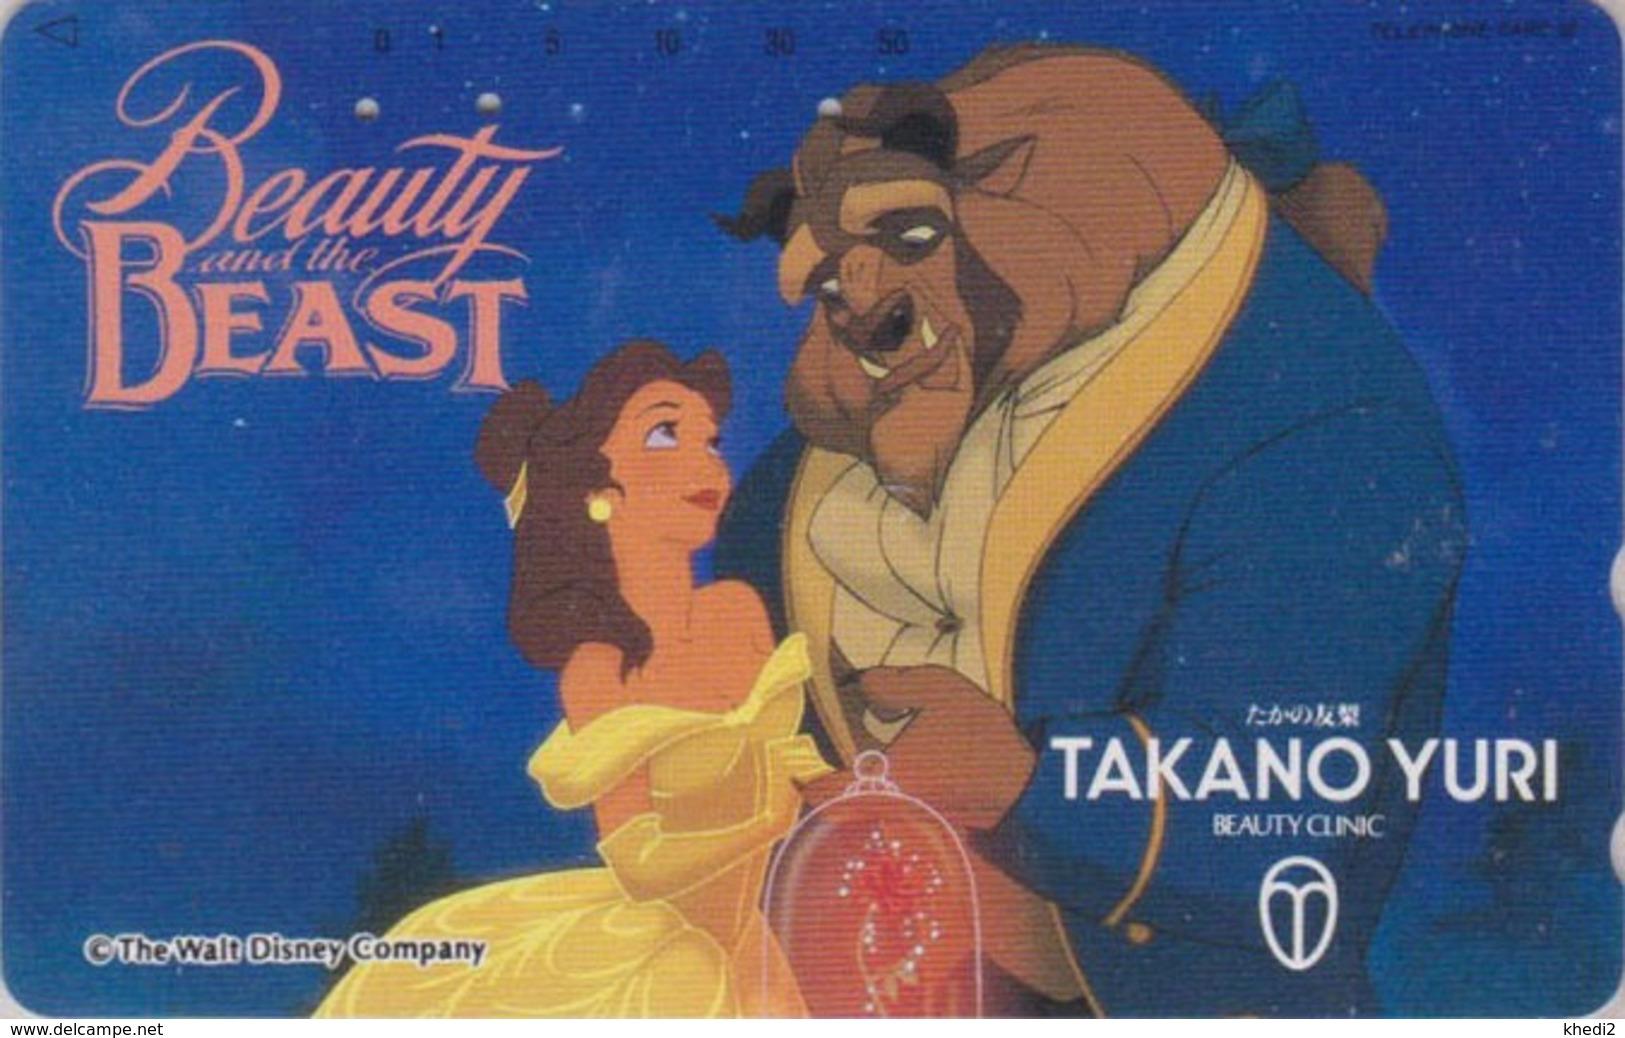 Télécarte Japon / 110-131813 - DISNEY - FILM BEAUTY & THE BEAST ** TAKANO YURI ** - Movie Japan Phonecard - Disney